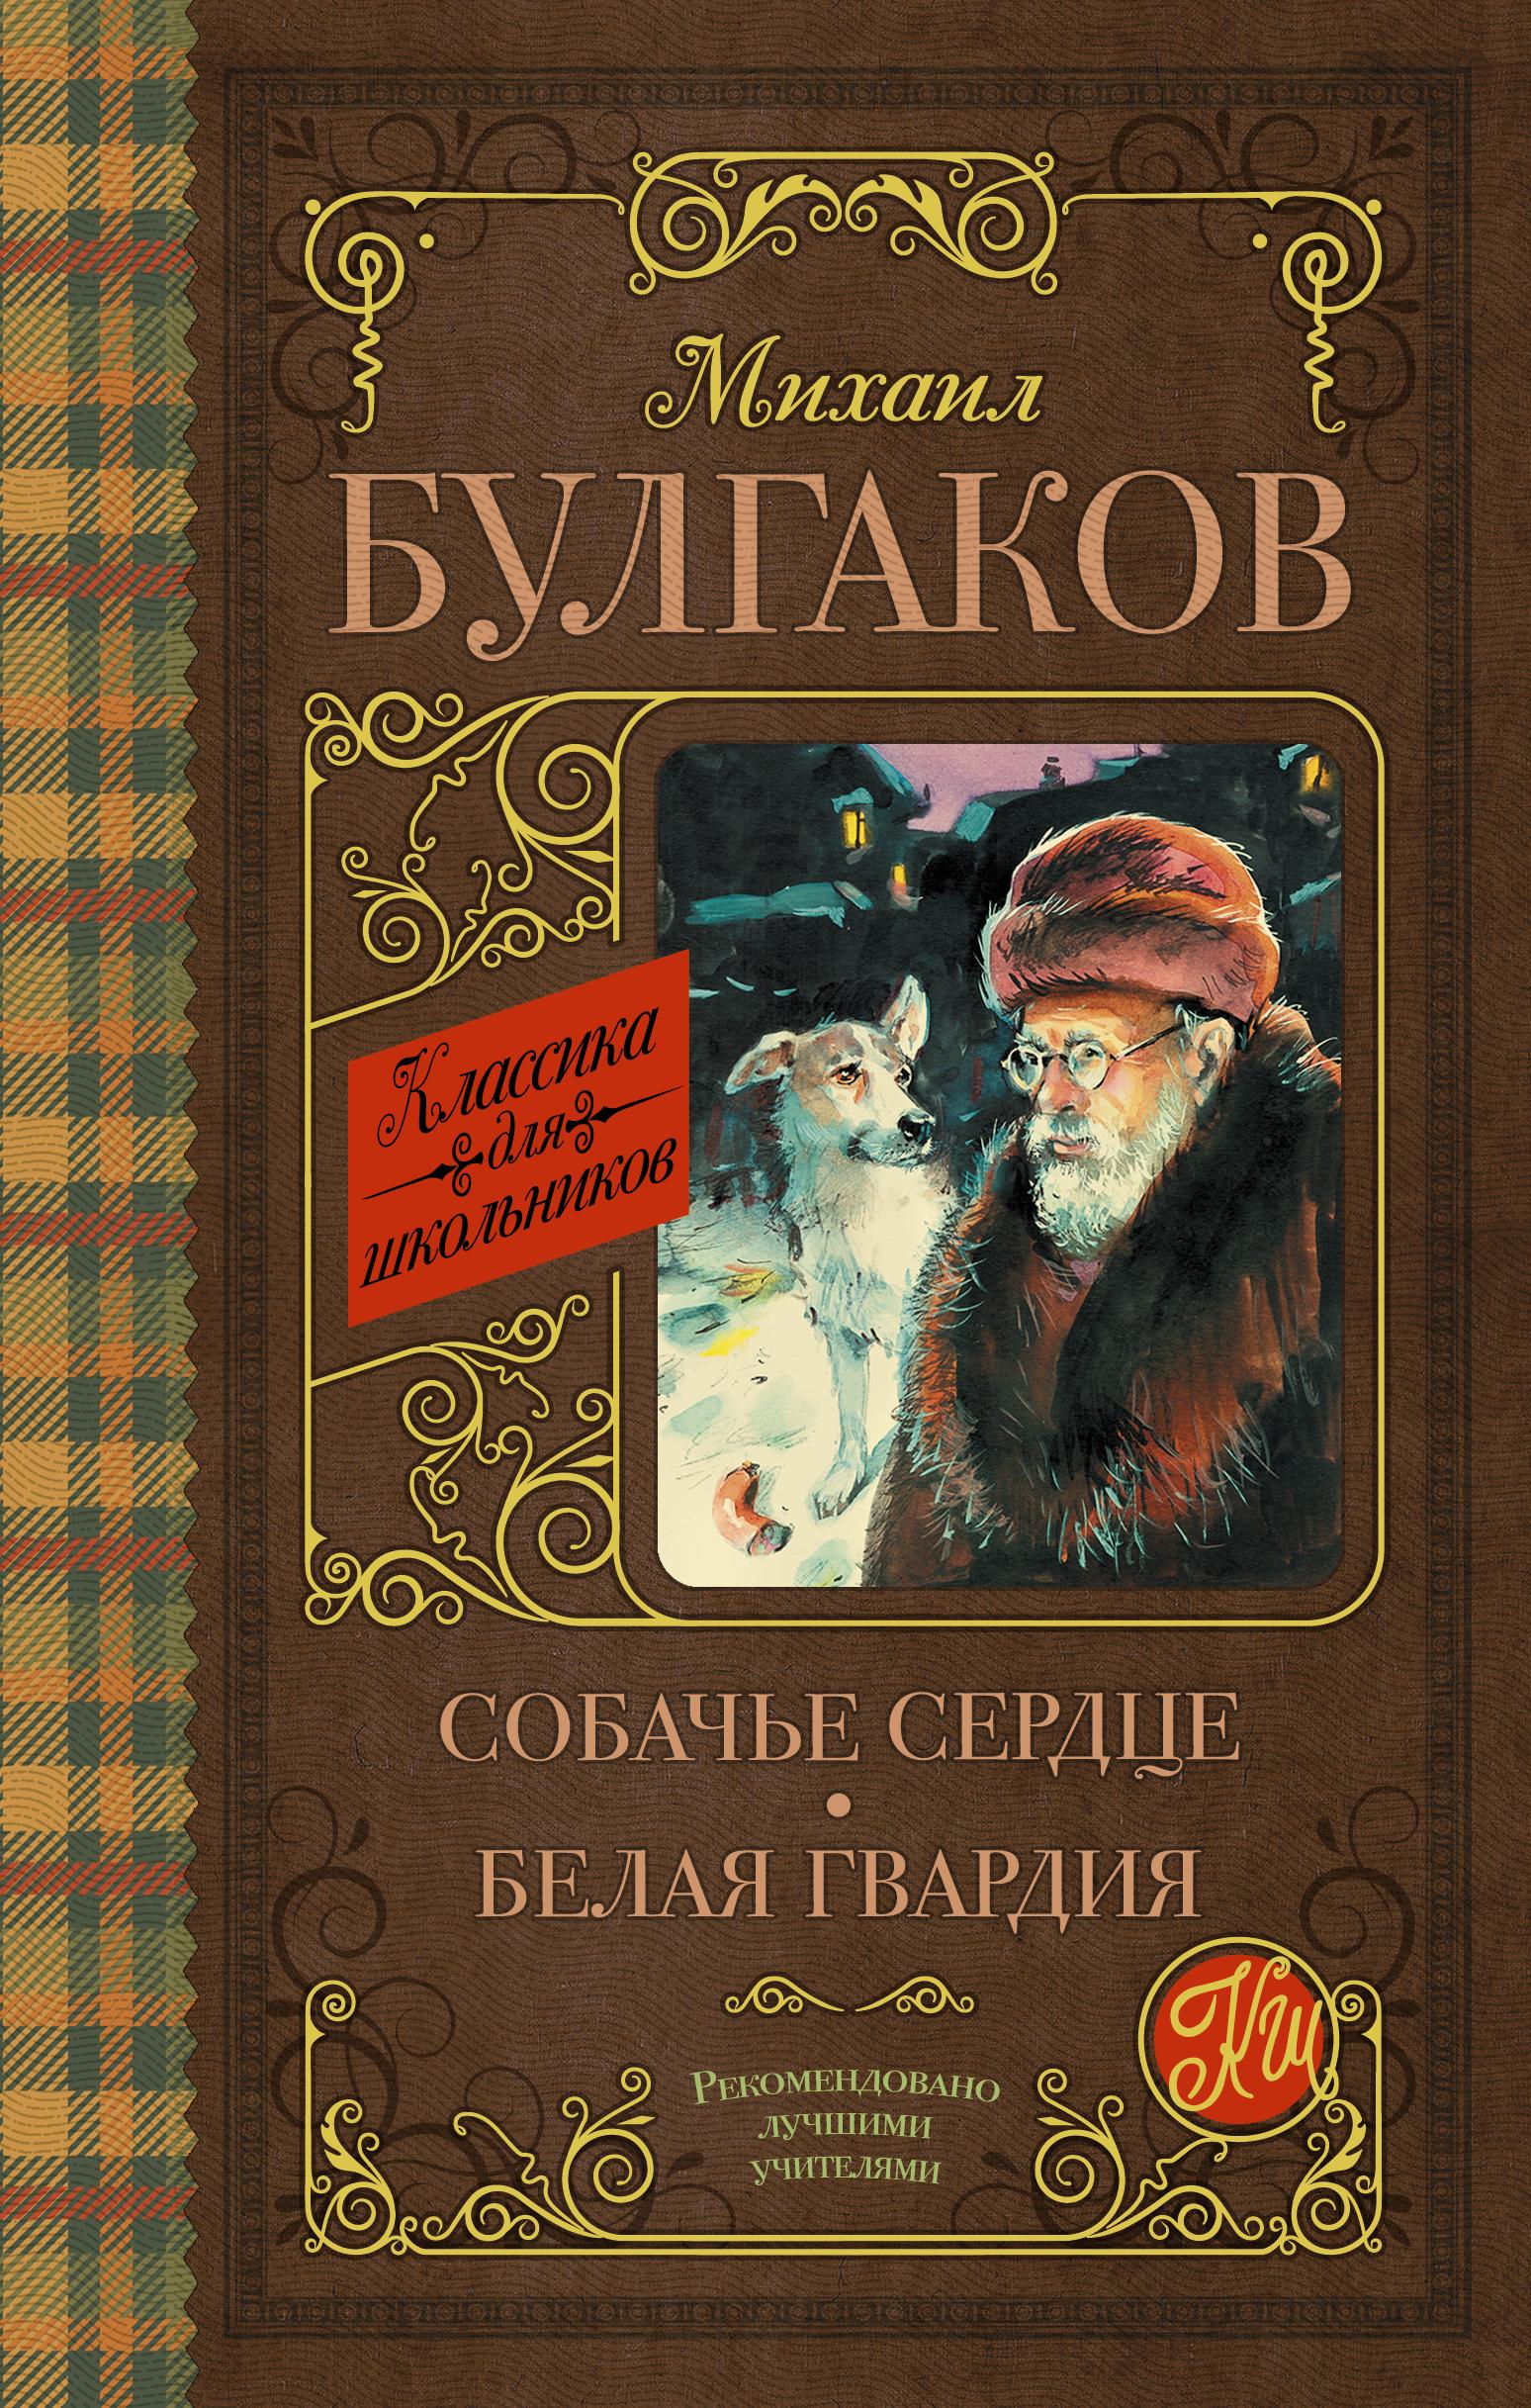 Михаил Булгаков Собачье сердце. Белая гвардия михаил булгаков собачье сердце театральный роман